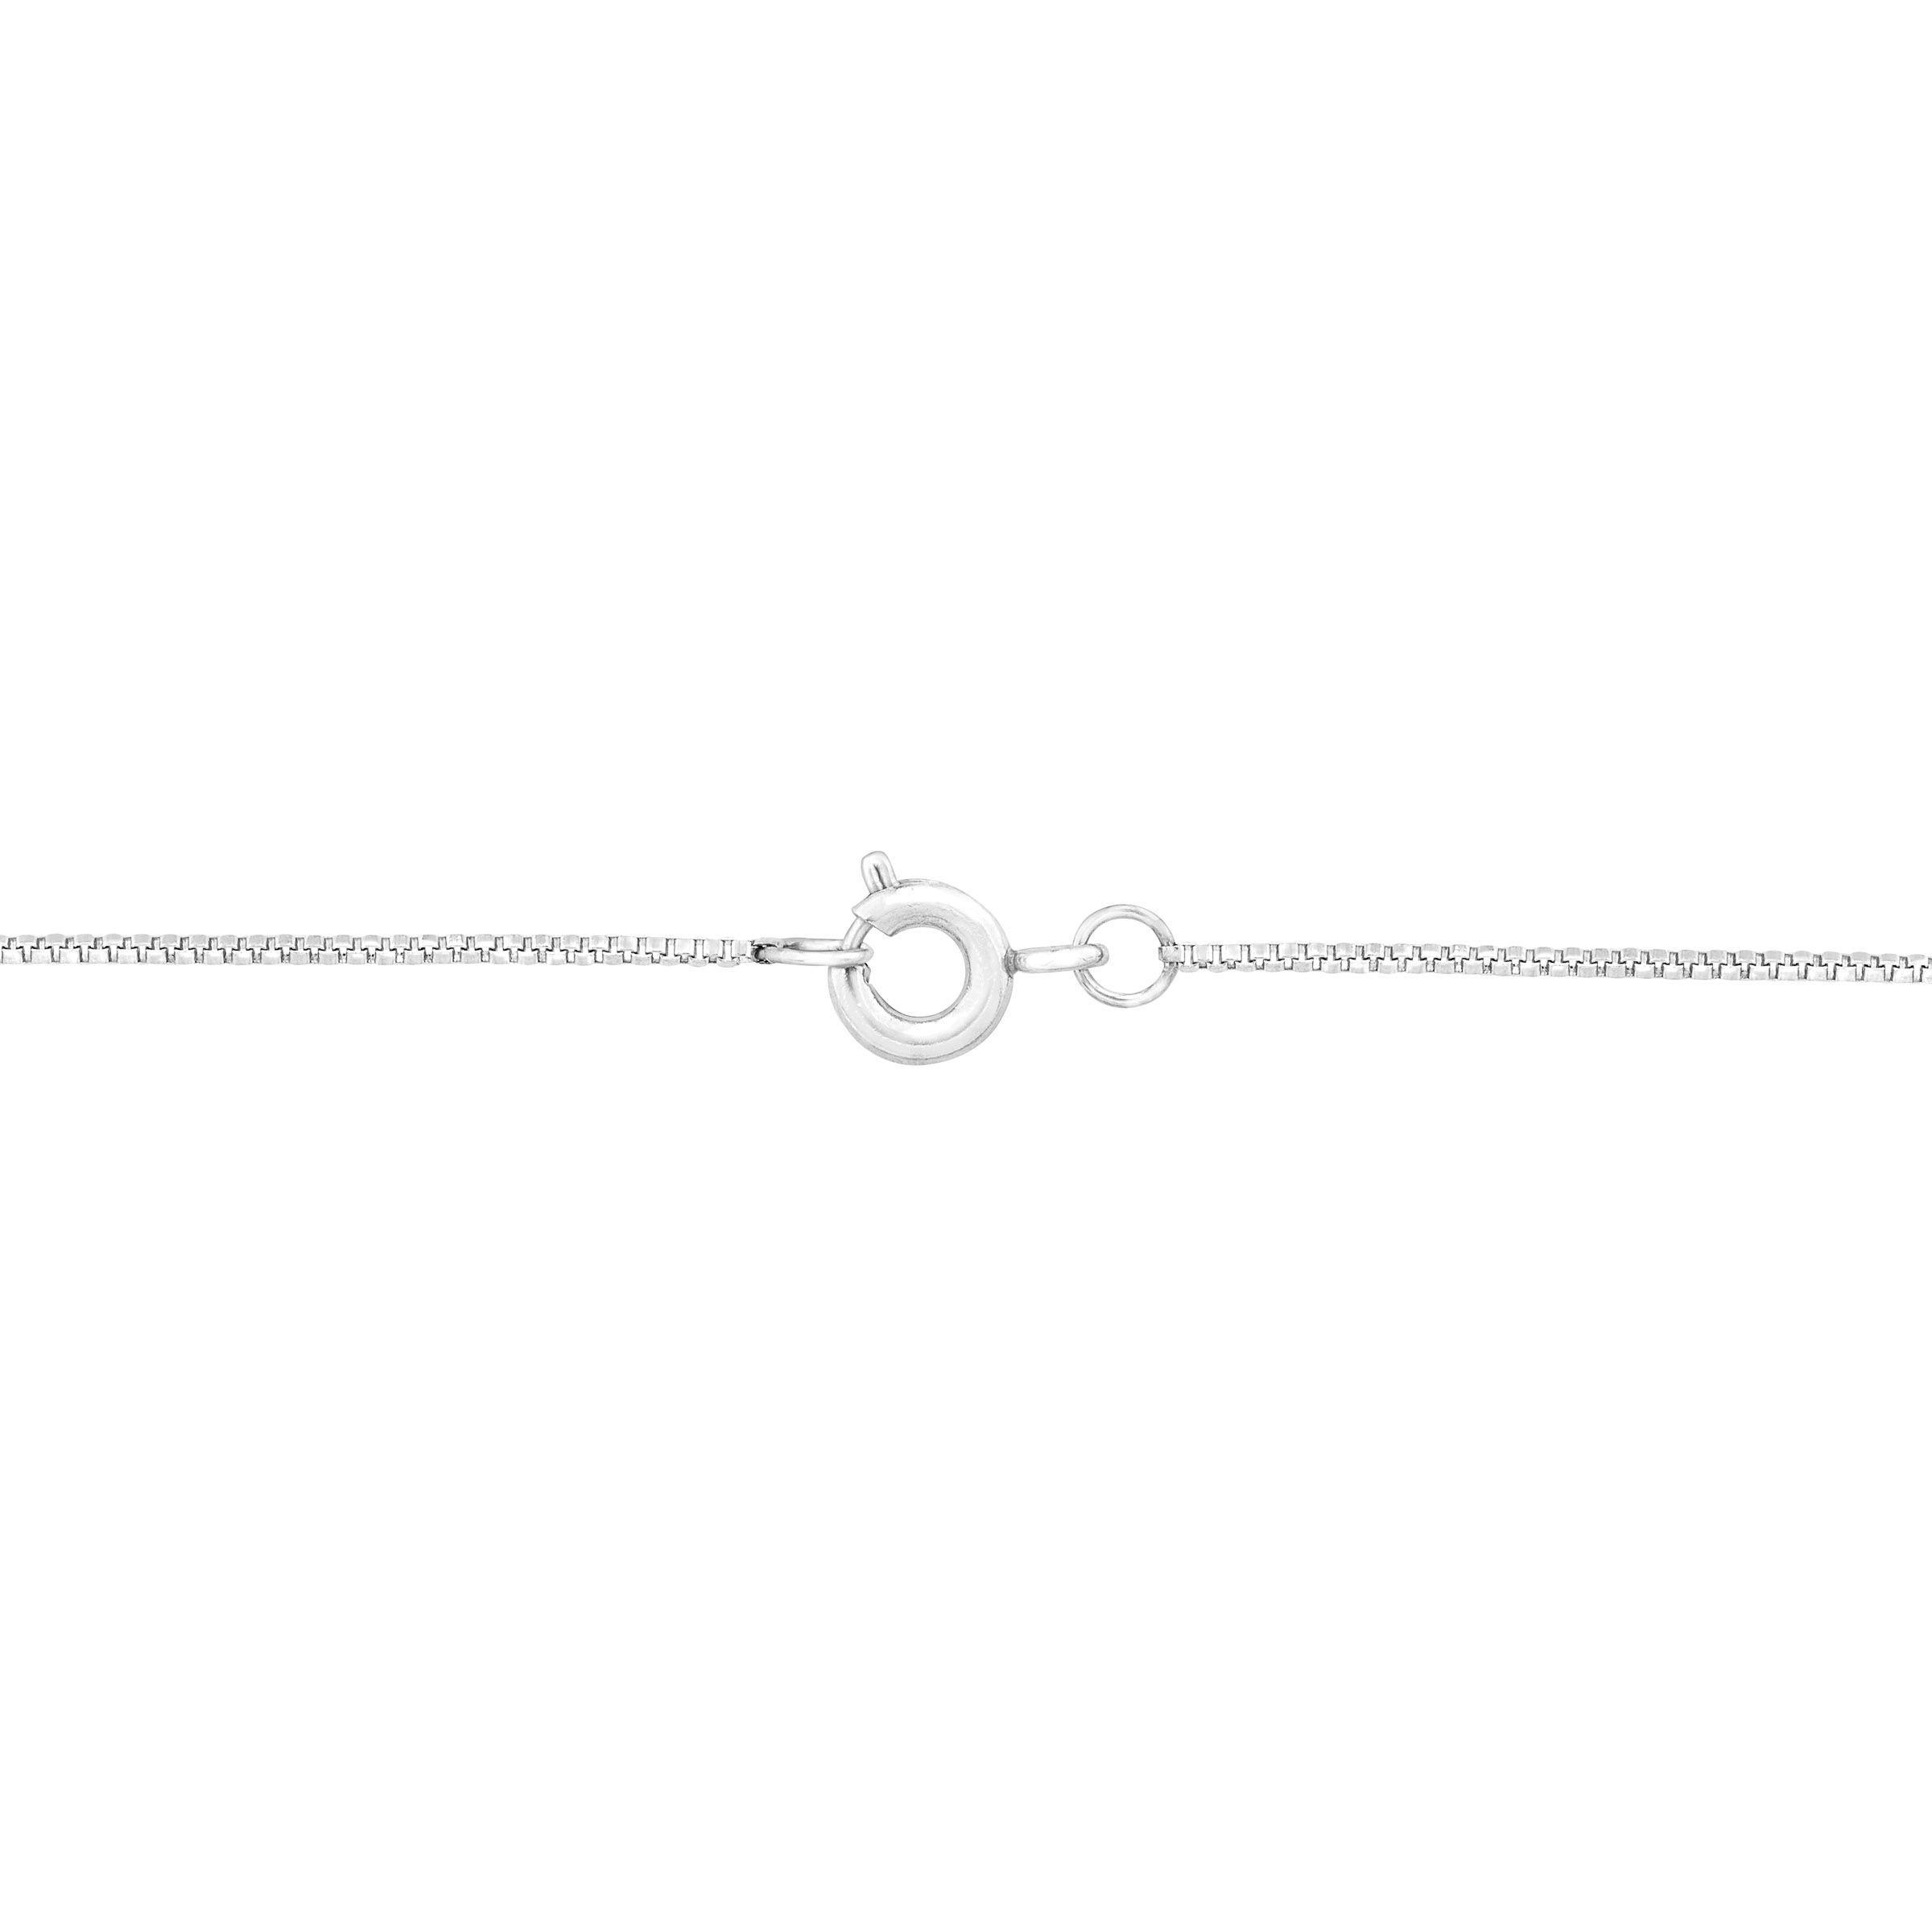 1 ct white sapphire journey pendant in 14k white gold ebay 1 ct white sapphire journey pendant in 14k white gold aloadofball Gallery